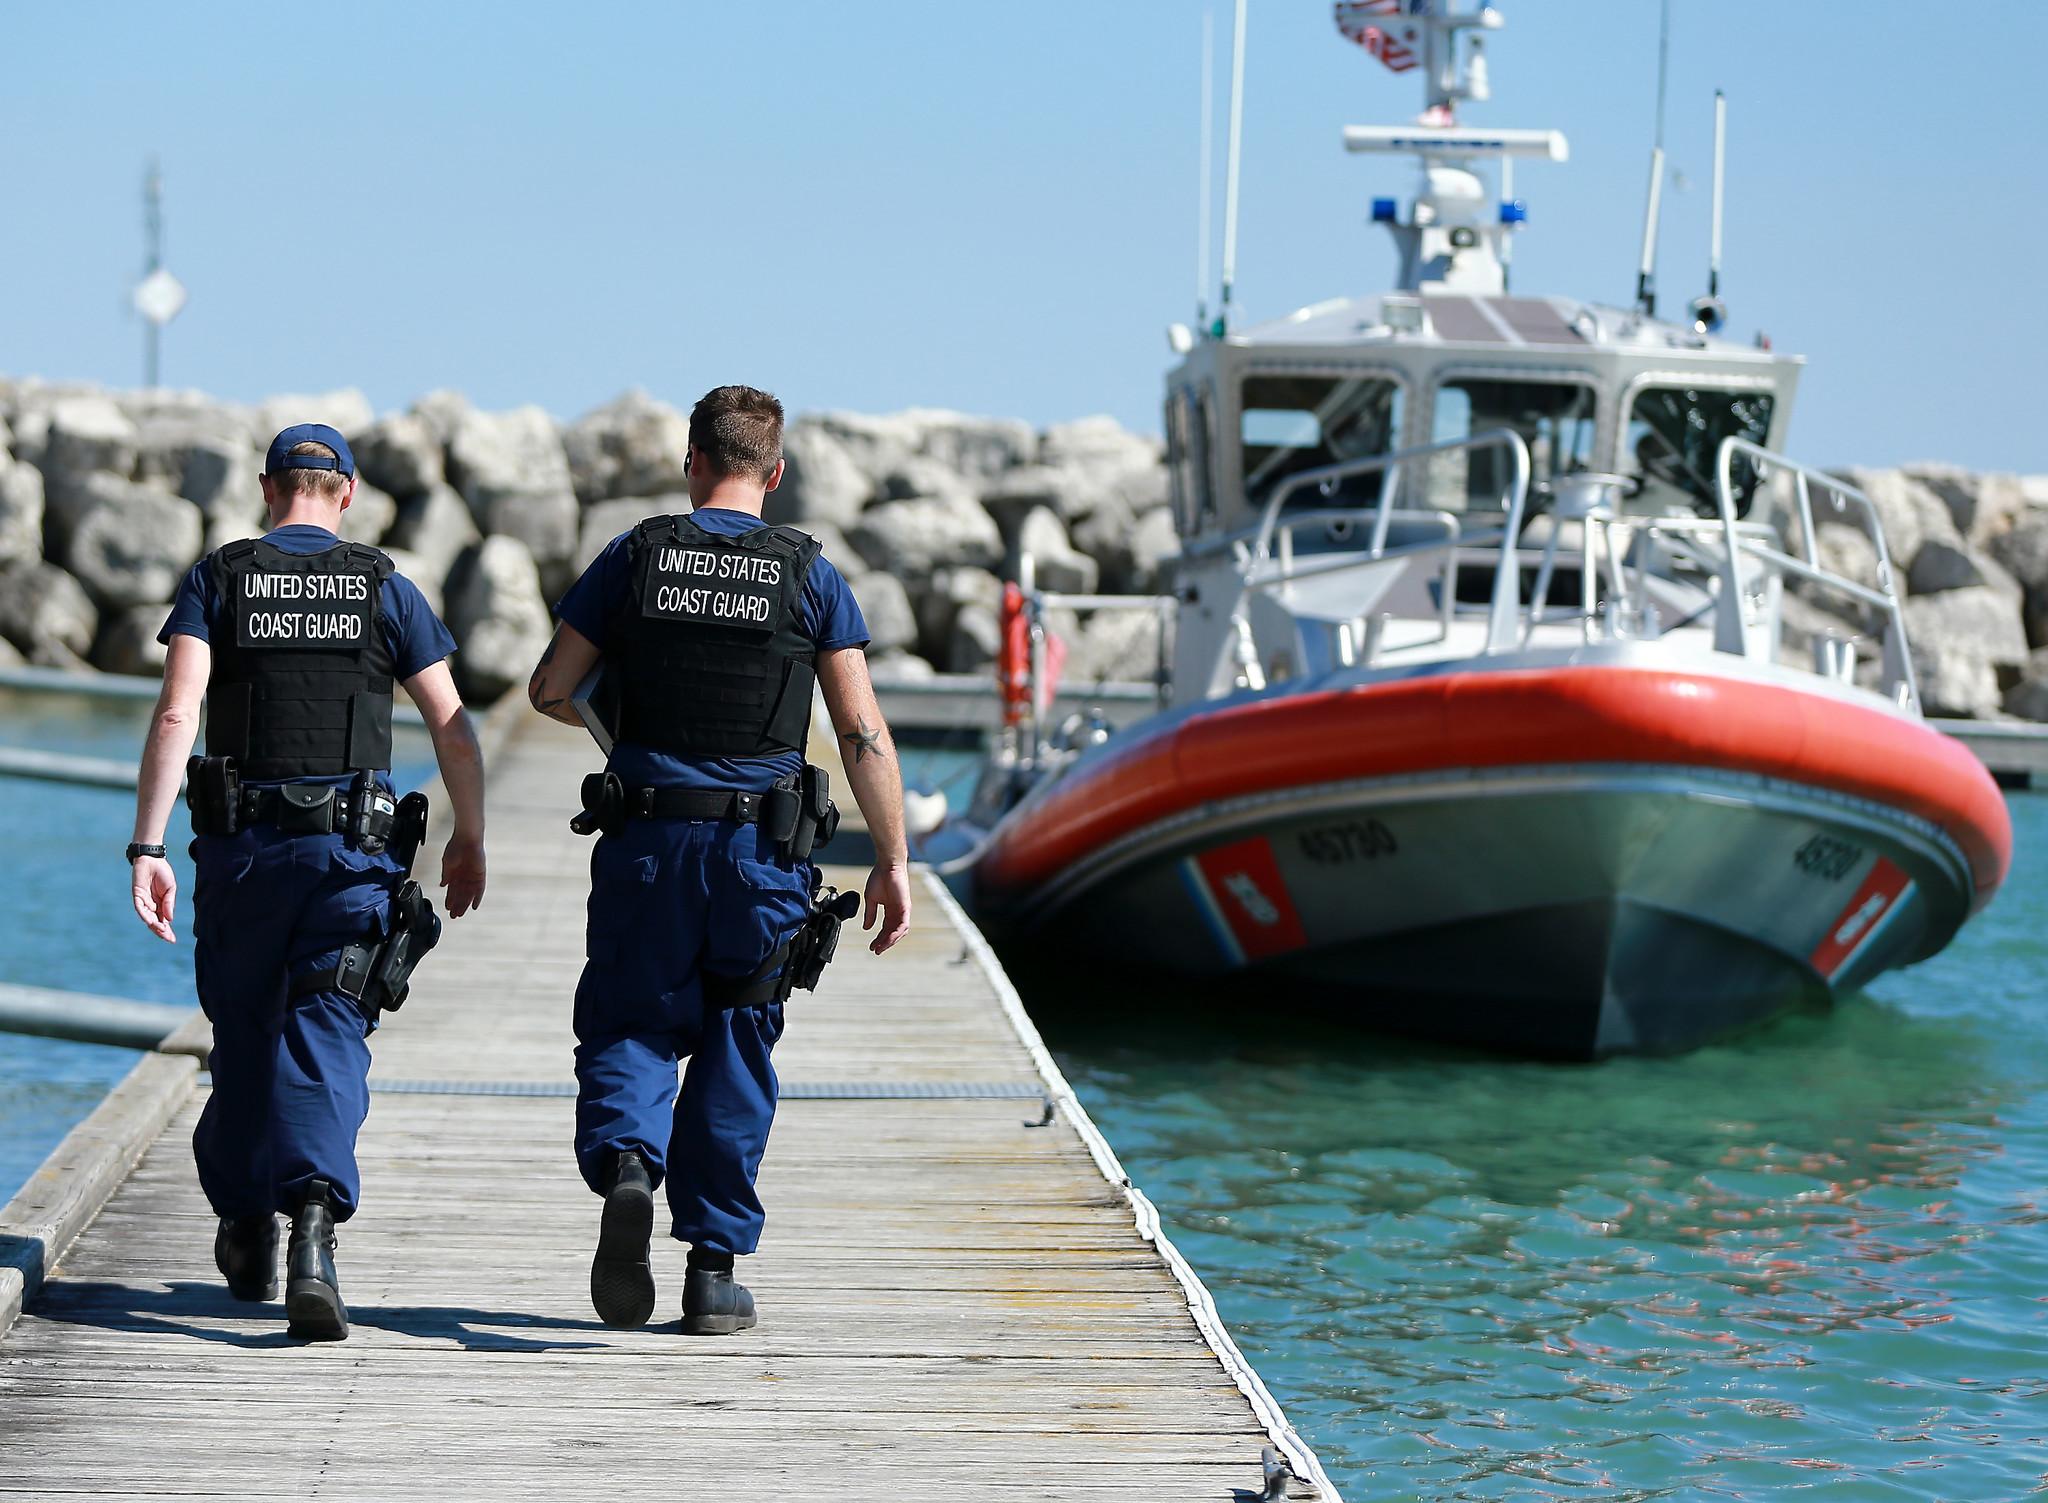 Real, fake distress calls on Lake Michigan spike: Coast Guard ...